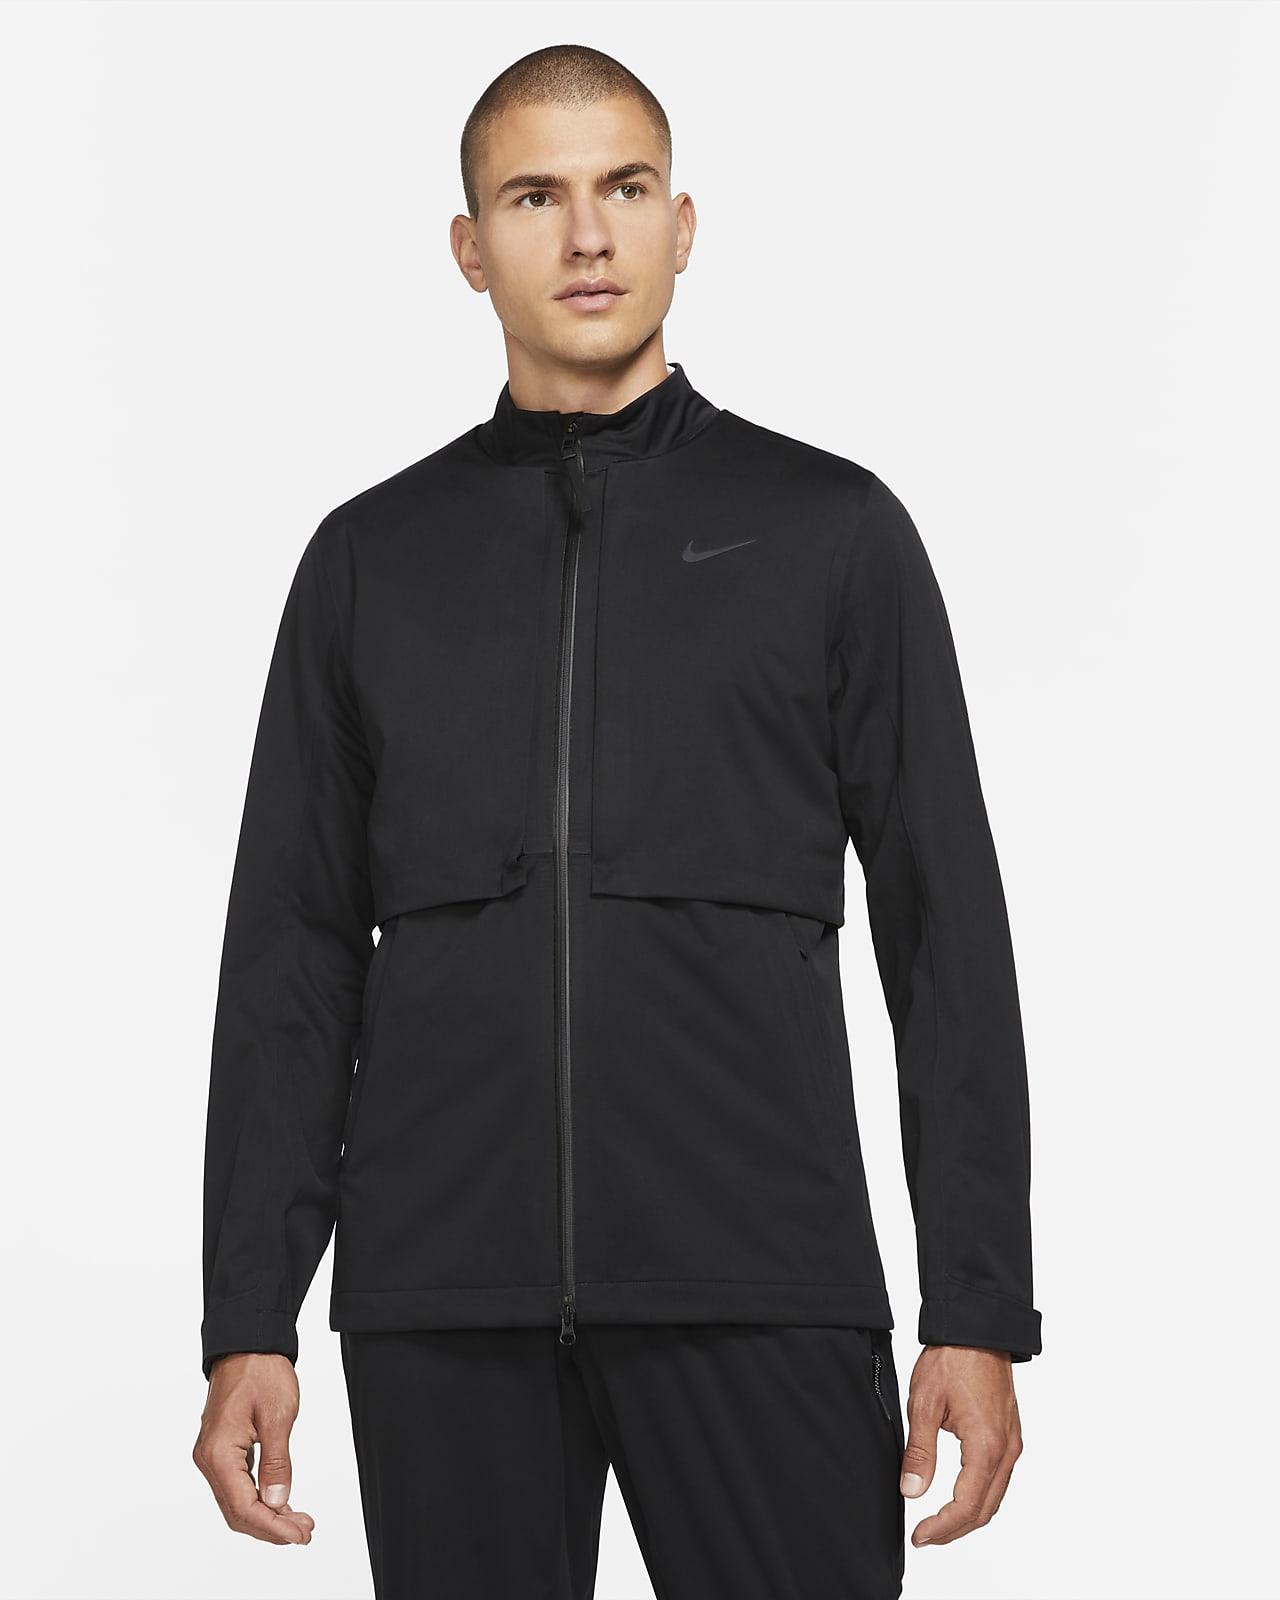 Nike Storm-FIT ADV Rapid Adapt Men's Golf Jacket